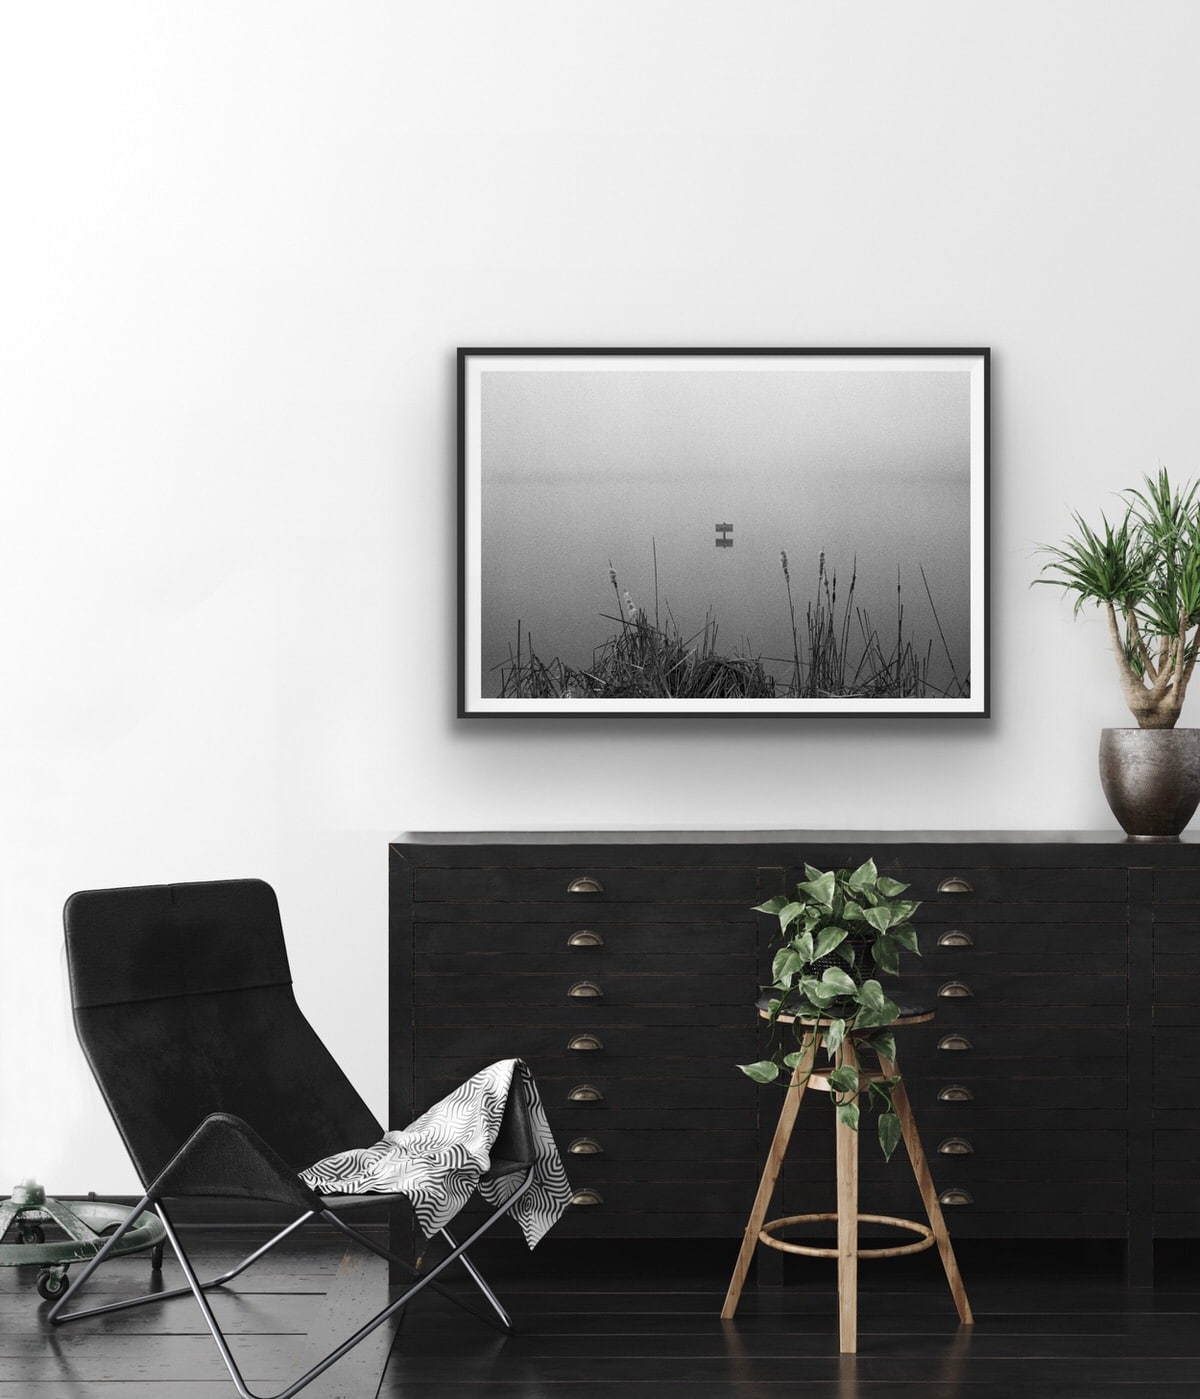 Black-and-white-fine-art-film-photography-wall-decor-by-emerging-artist-Studio-L-photographer-Laura-Schneider-_4711